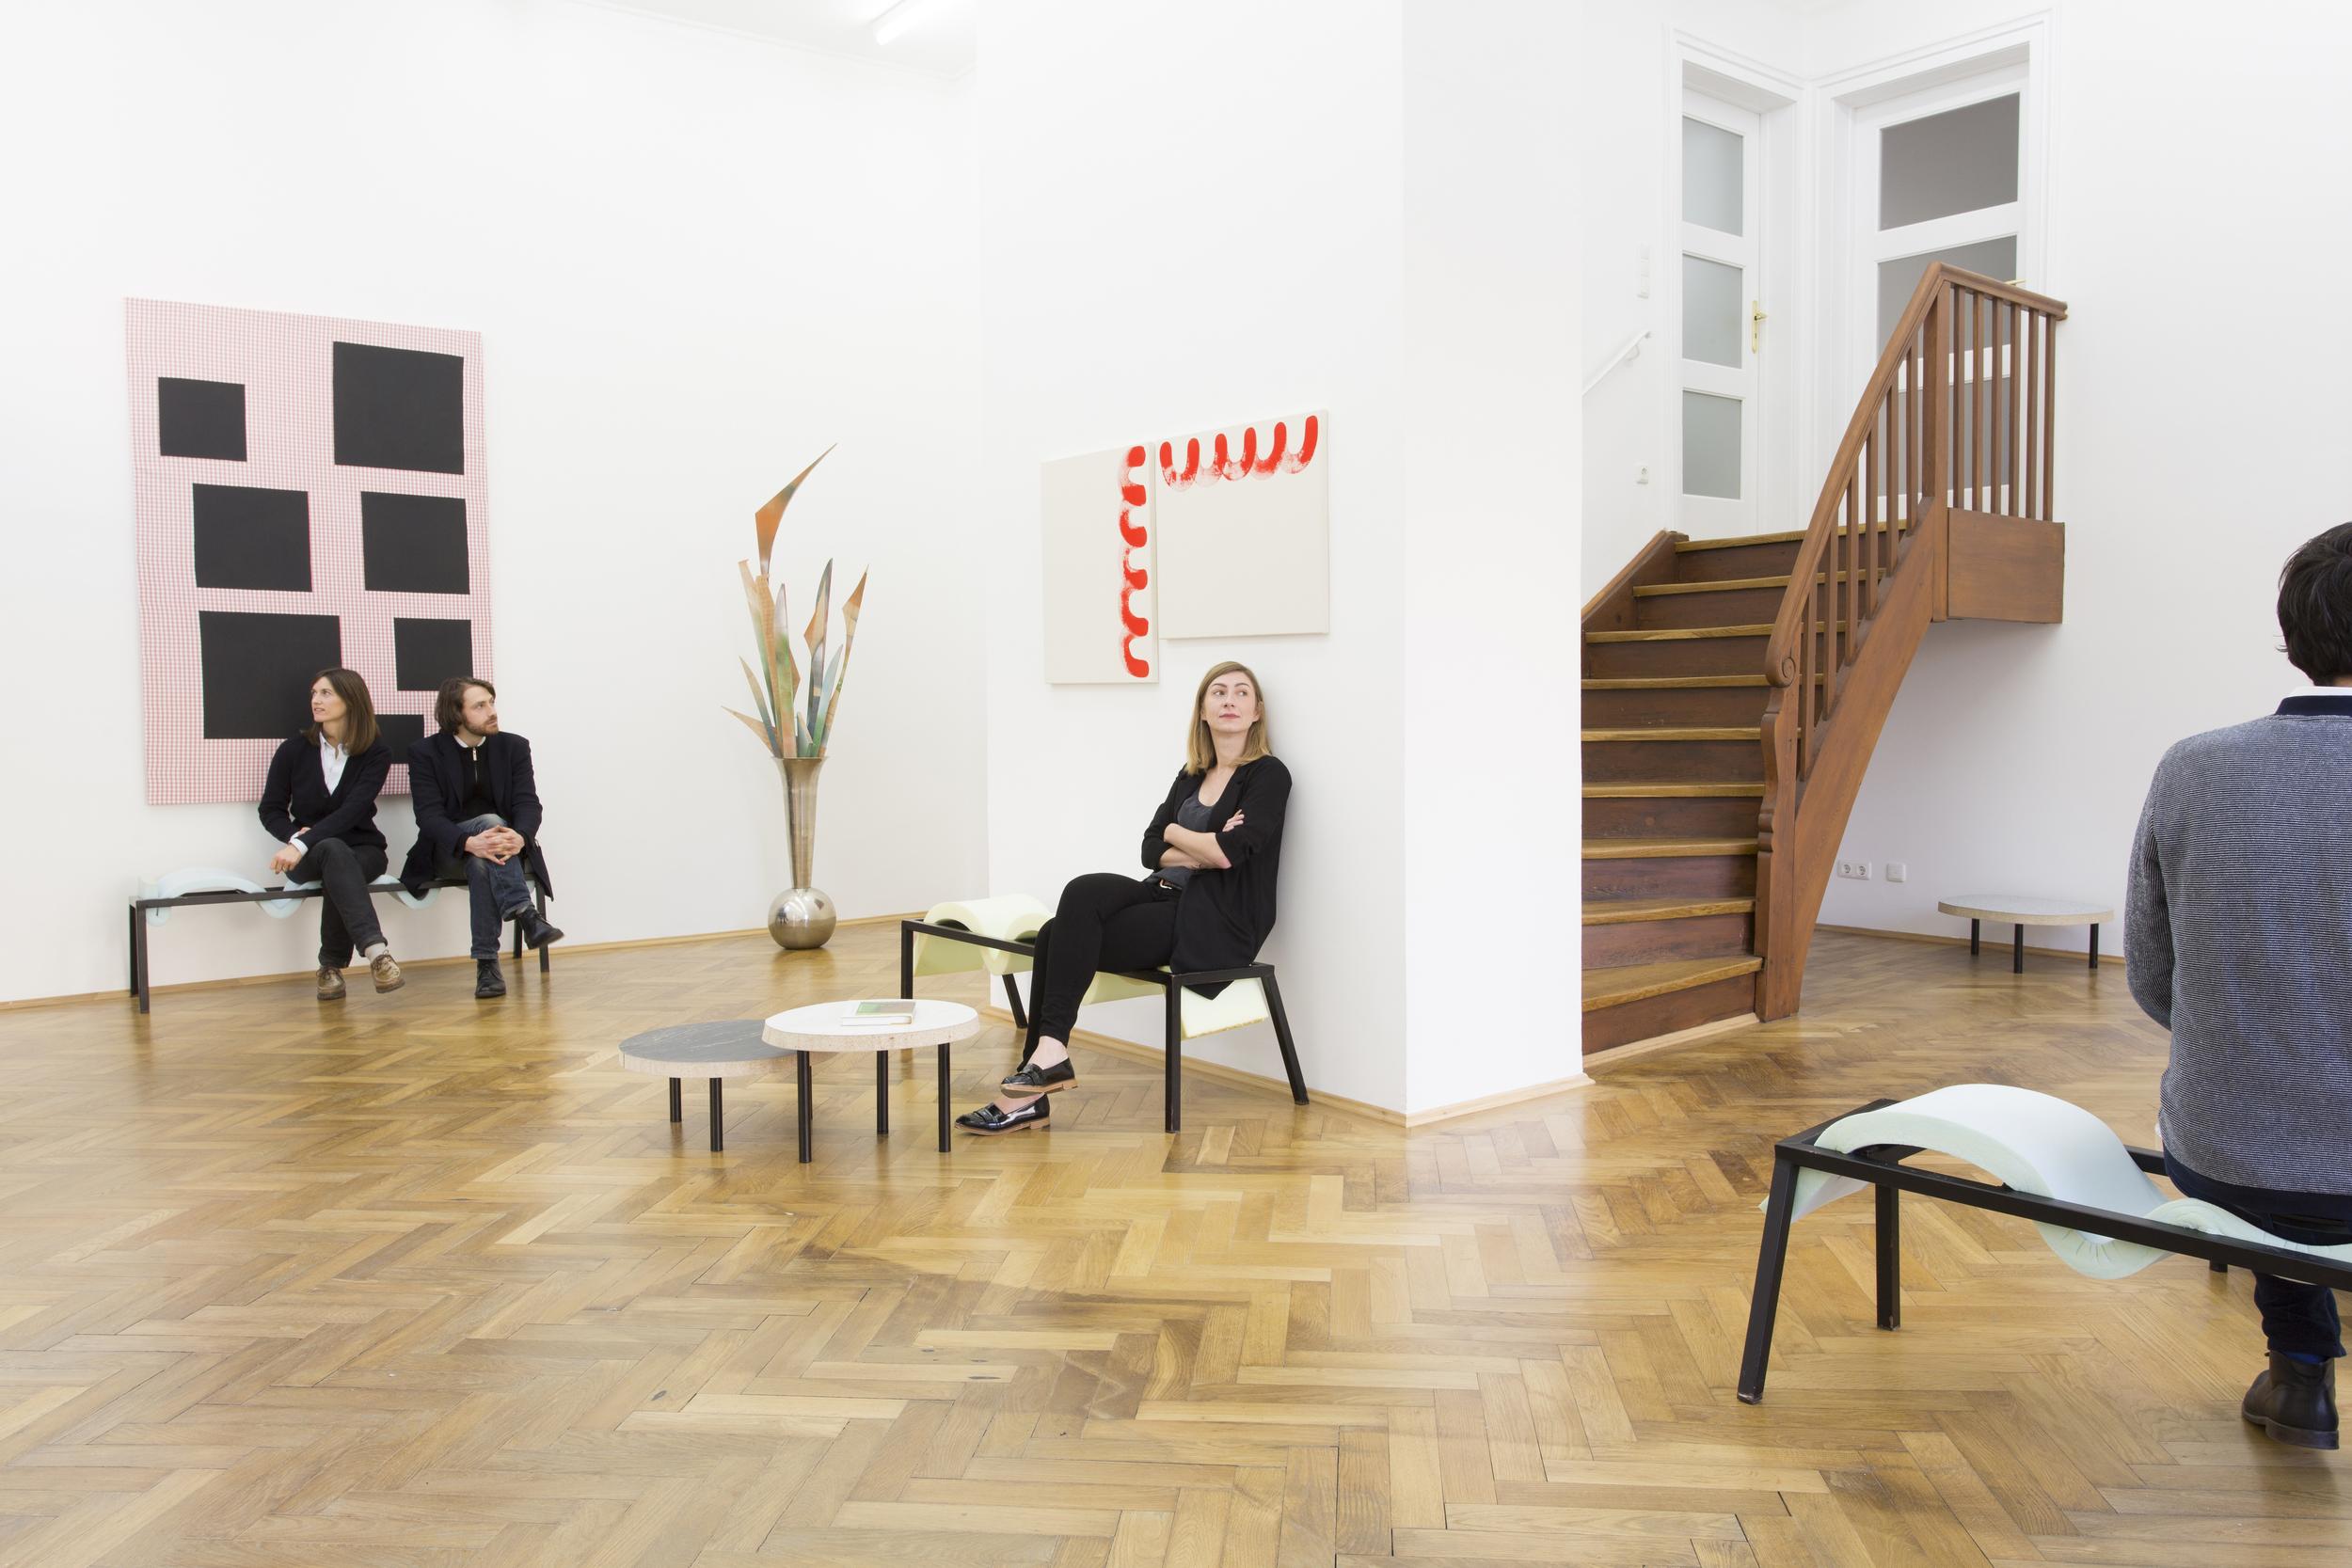 Elvire Bonduelle - waiting room #4 - installation view